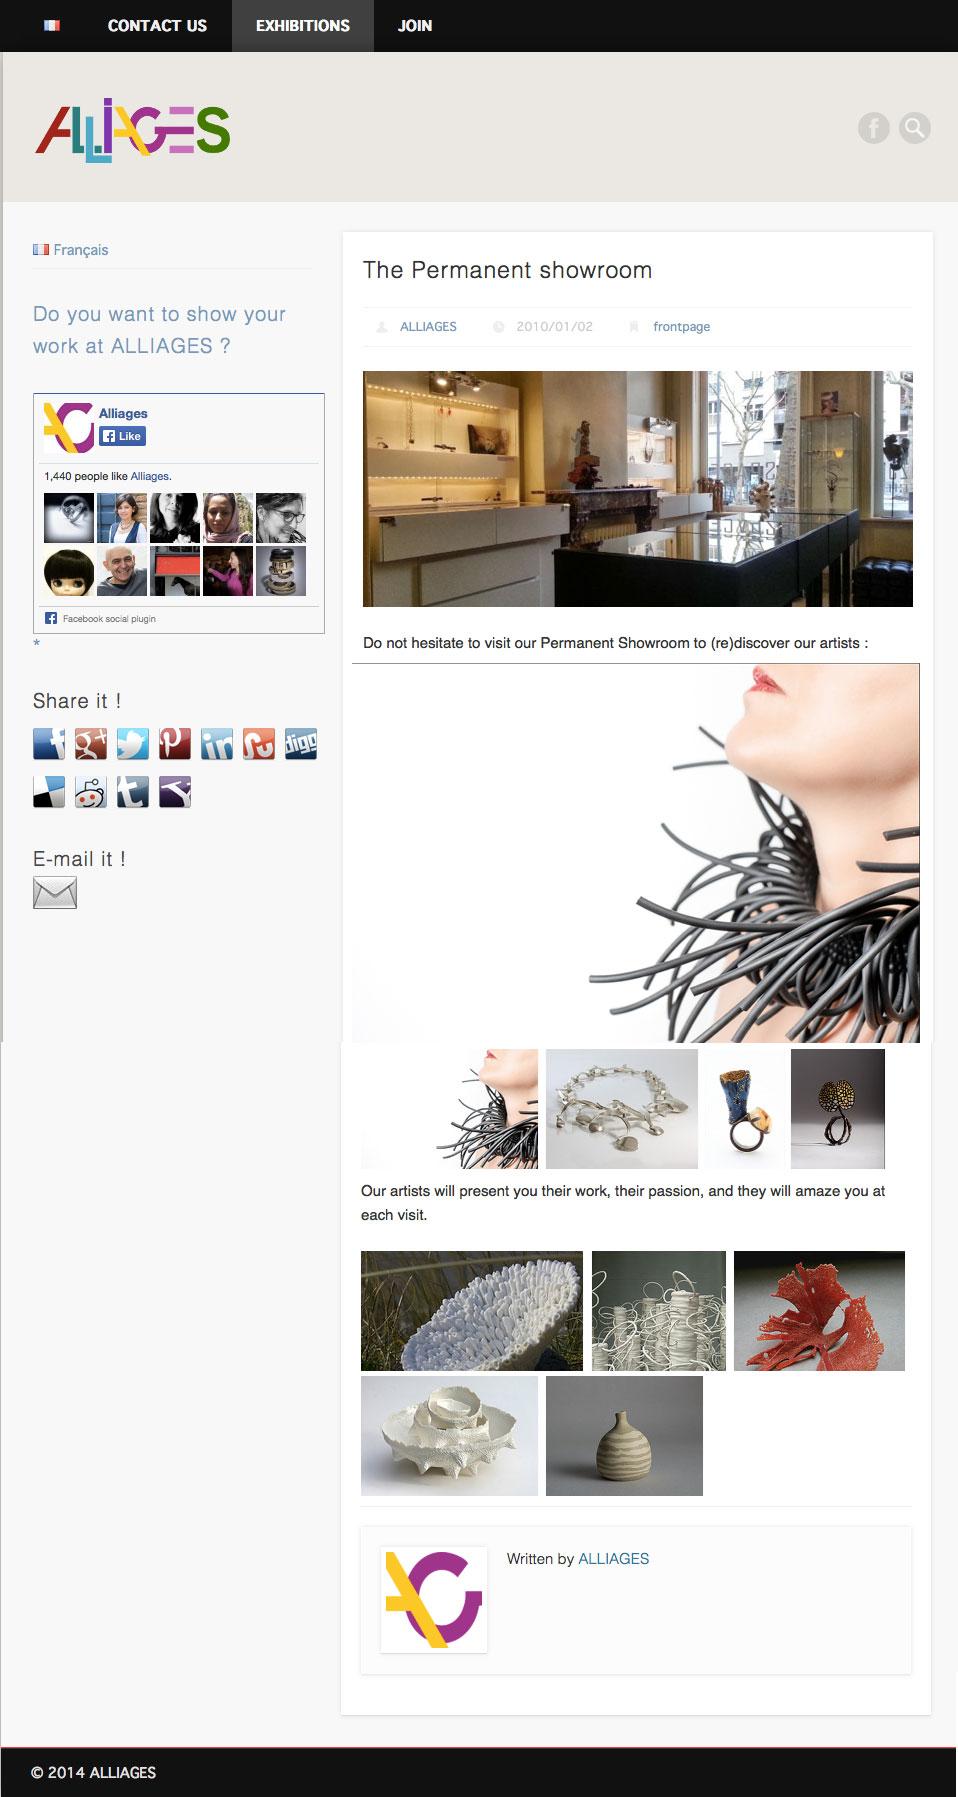 Alliages, alliages.org – febbraio 2014